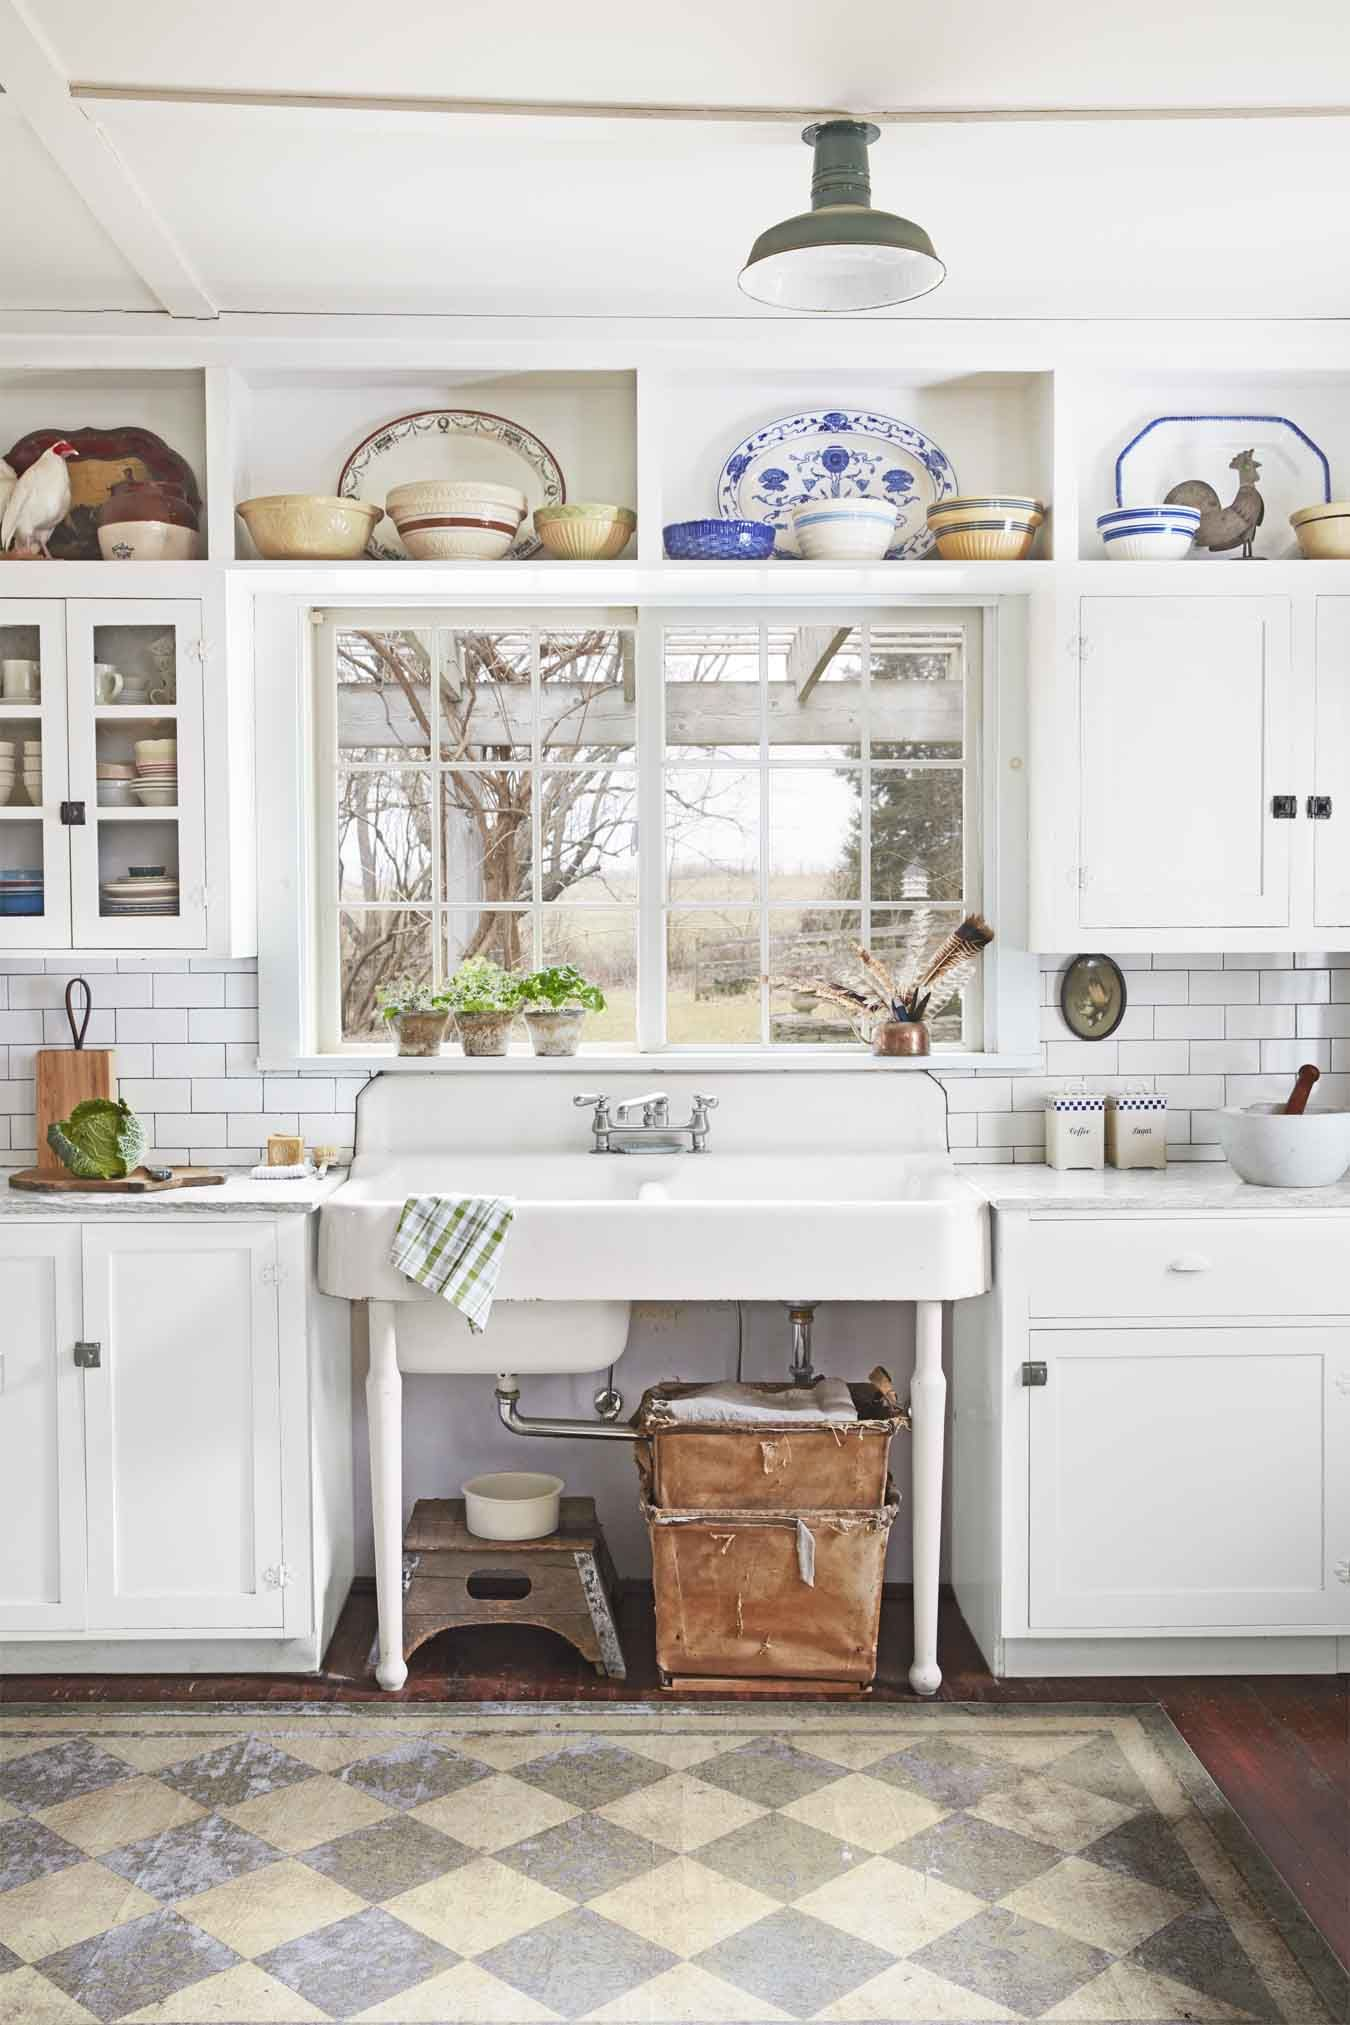 20 Vintage Kitchen Decorating Ideas Design Inspiration For Retro